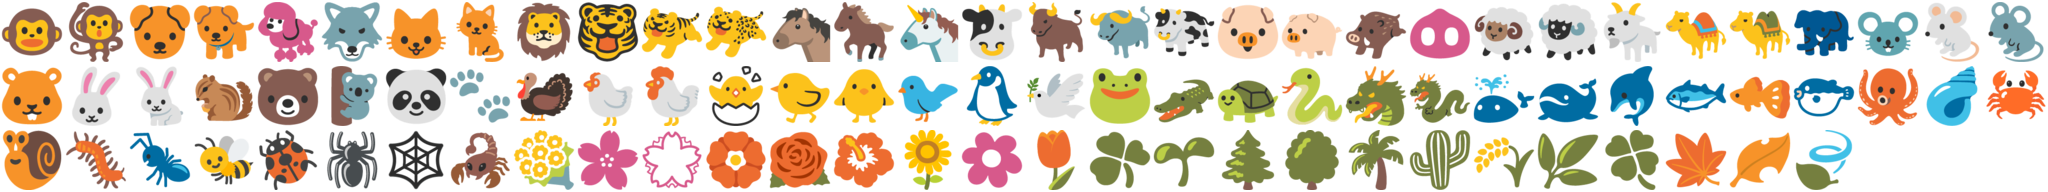 briar-android/assets/emoji_animals_nature.png